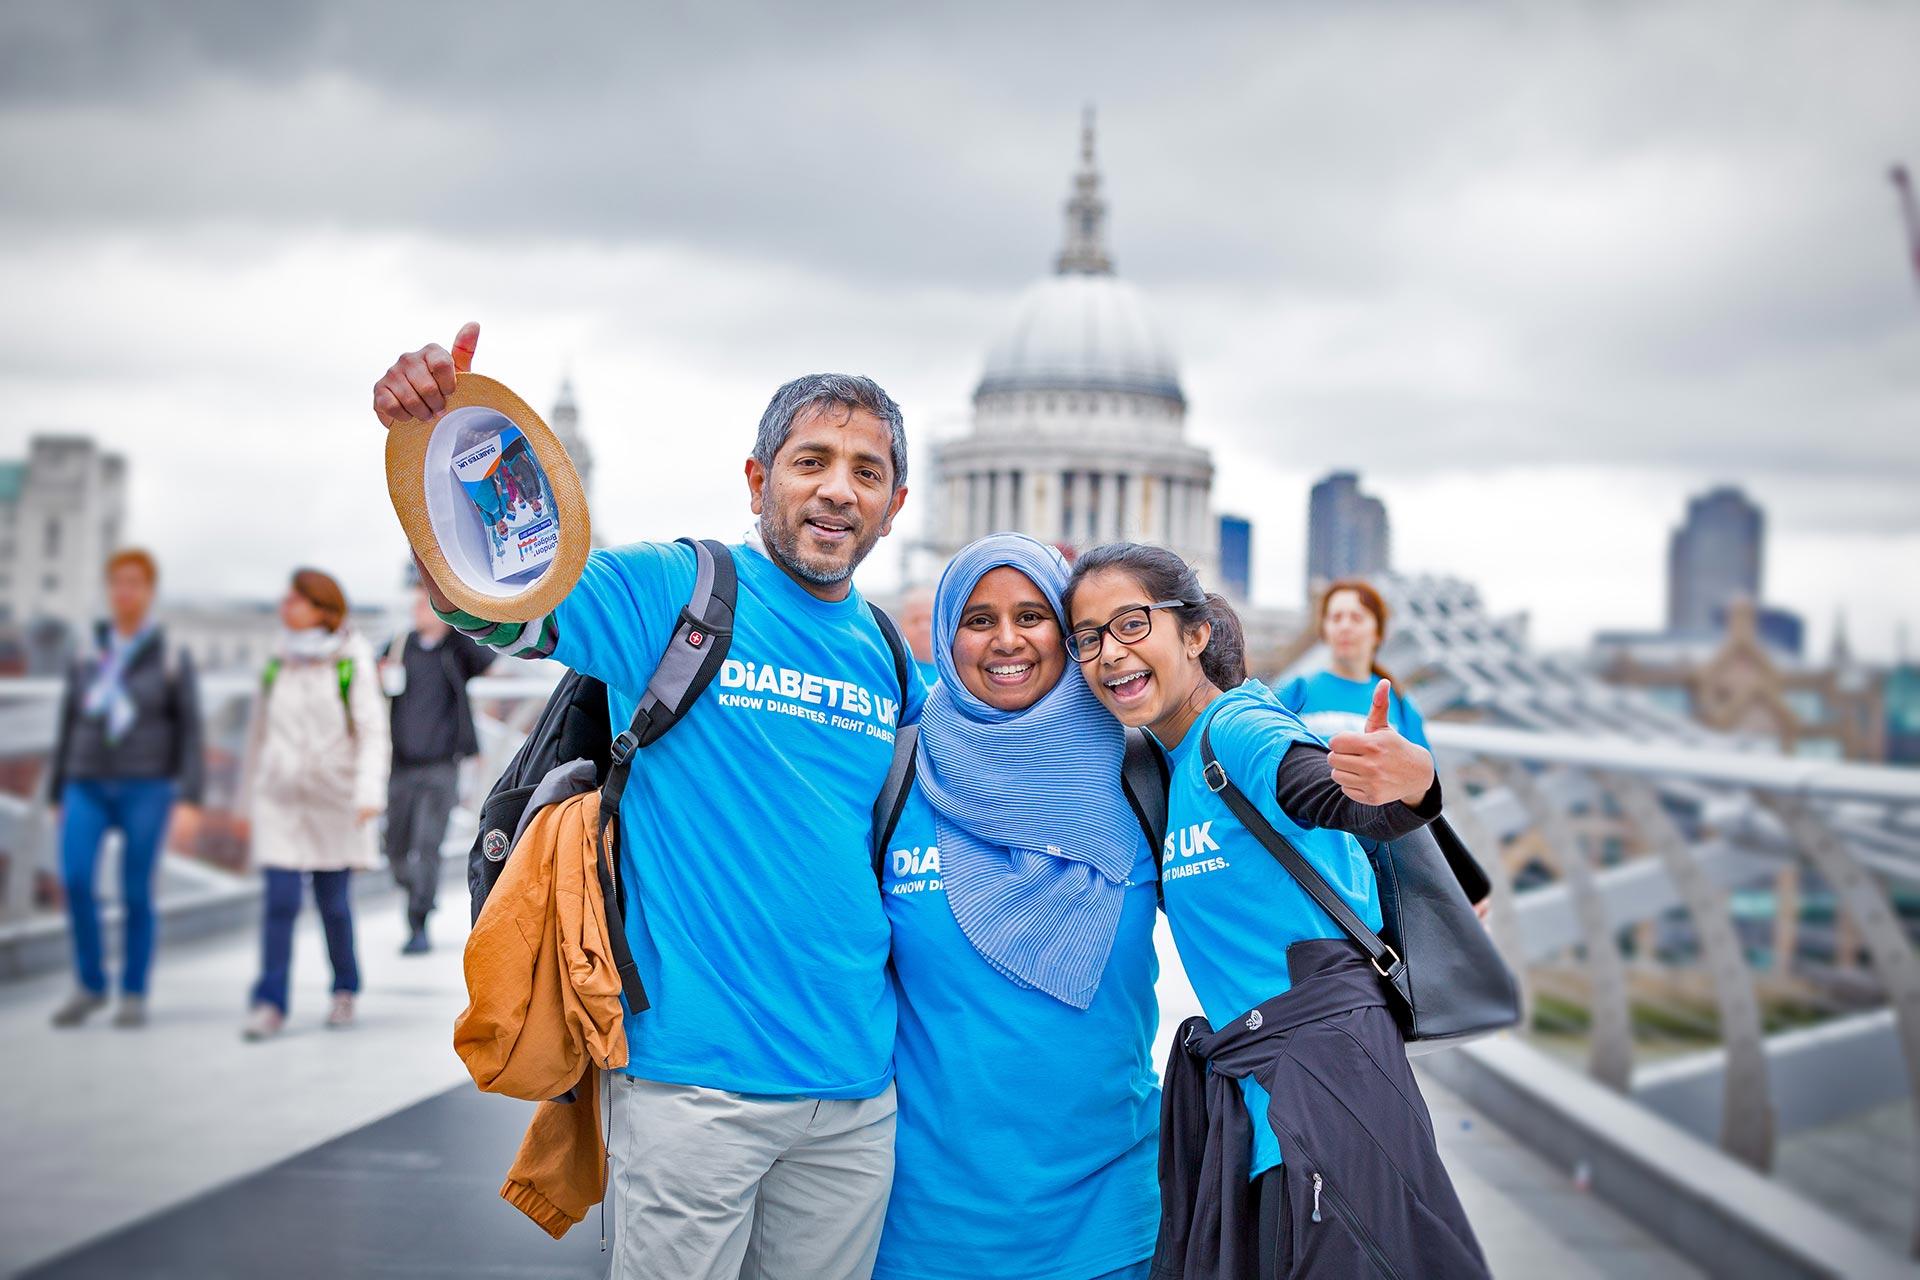 Diabetes-UK-London-Bridges-Challenge-on-1st-October-2017-©-Brendan-Foster-Photography-477-Edit-33.jpg